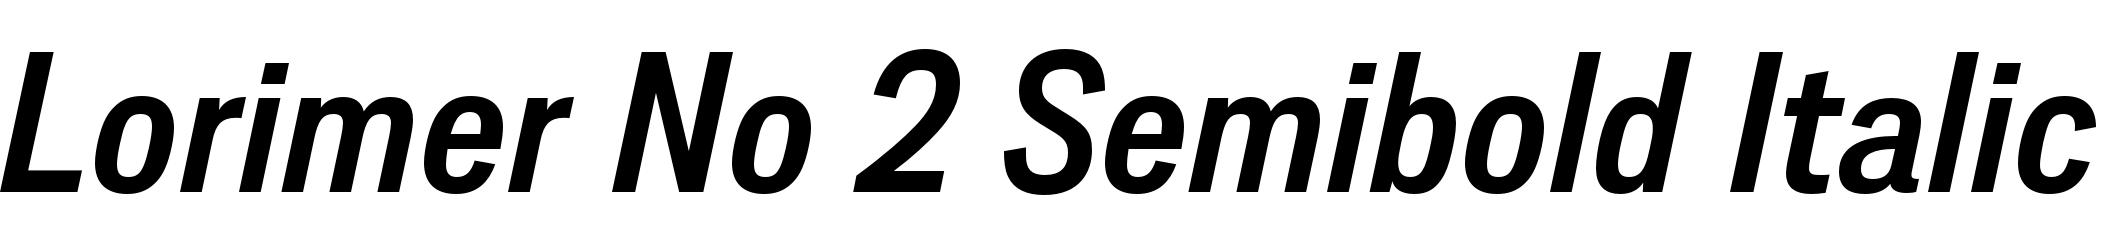 Lorimer No 2 Semibold Italic